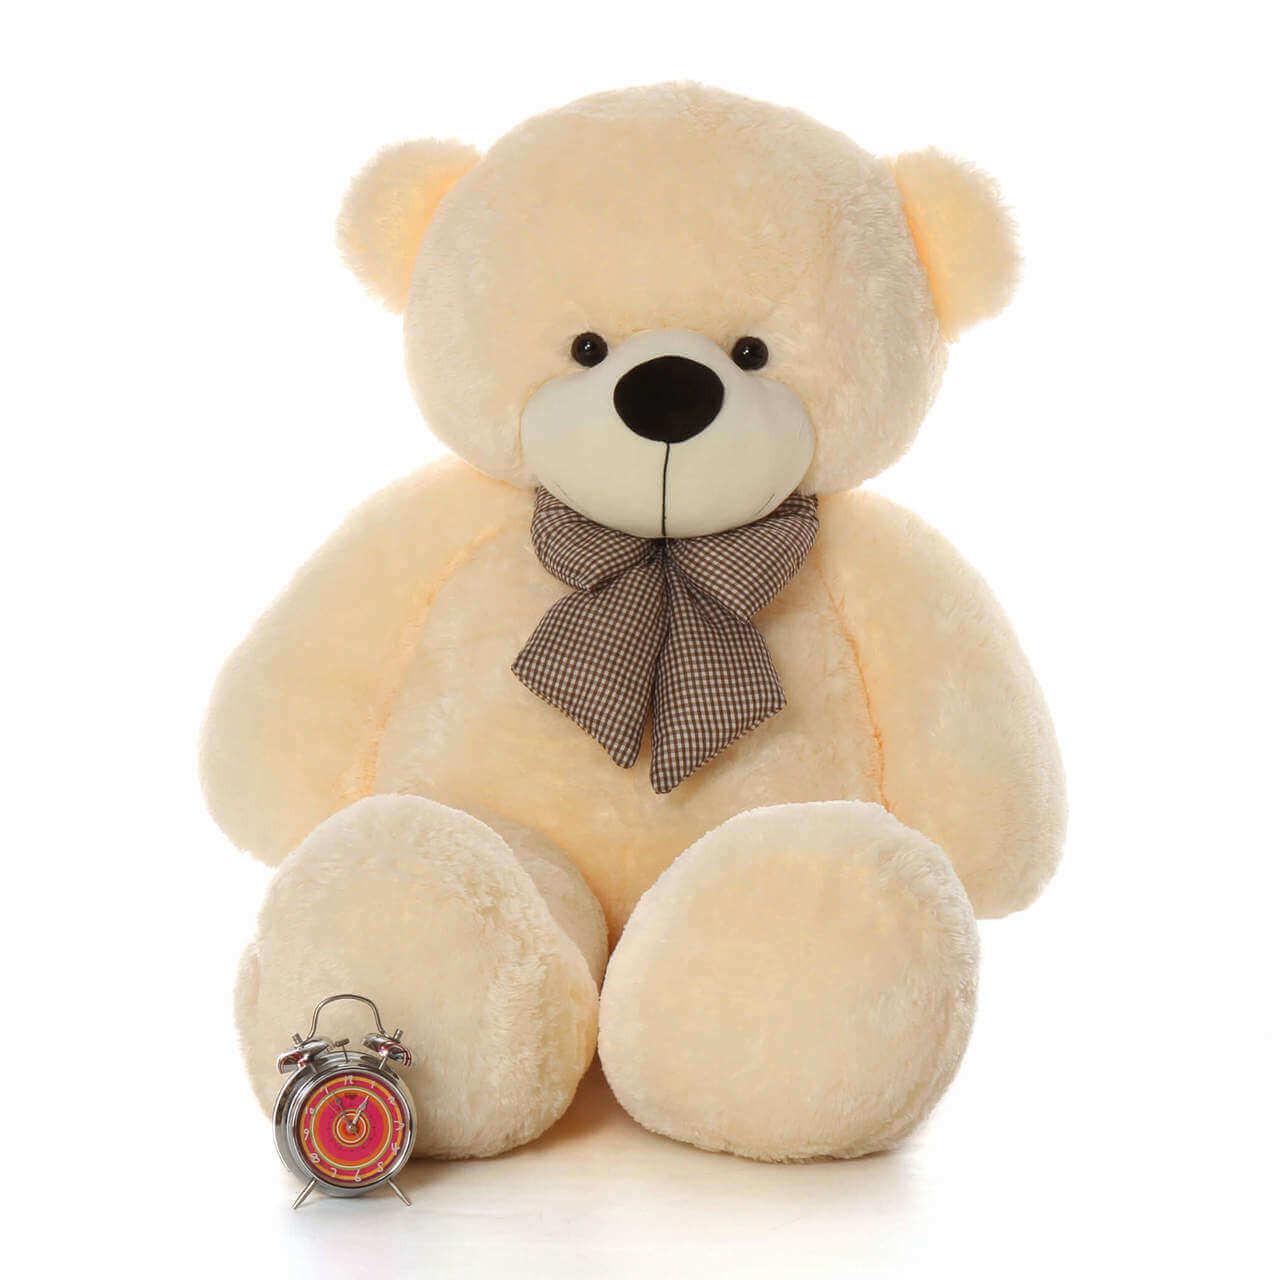 Cozy Cuddles Soft and Huggable Jumbo Cream Teddy Bear 60in One of the Biggest Teddy Bears!